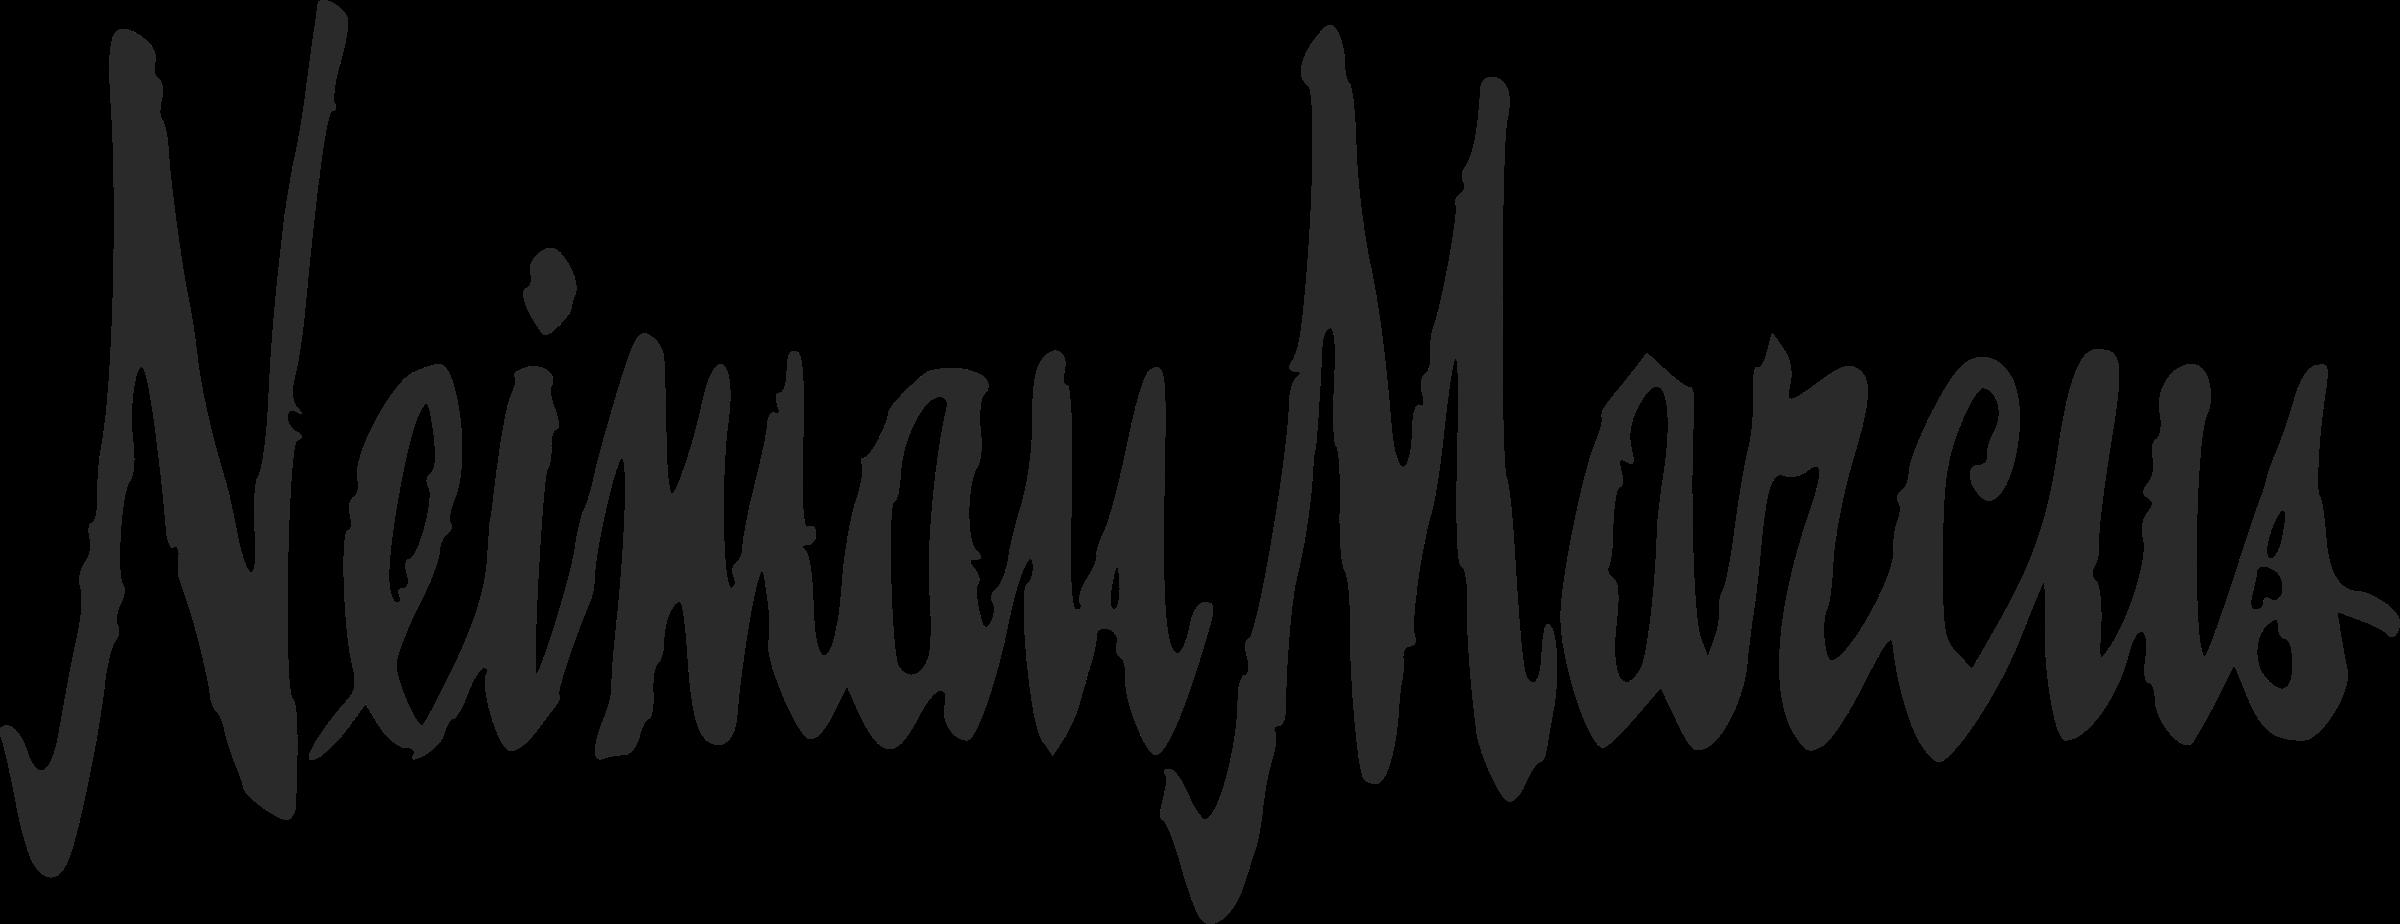 Neiman Marcus Logo PNG Transparent & SVG Vector.